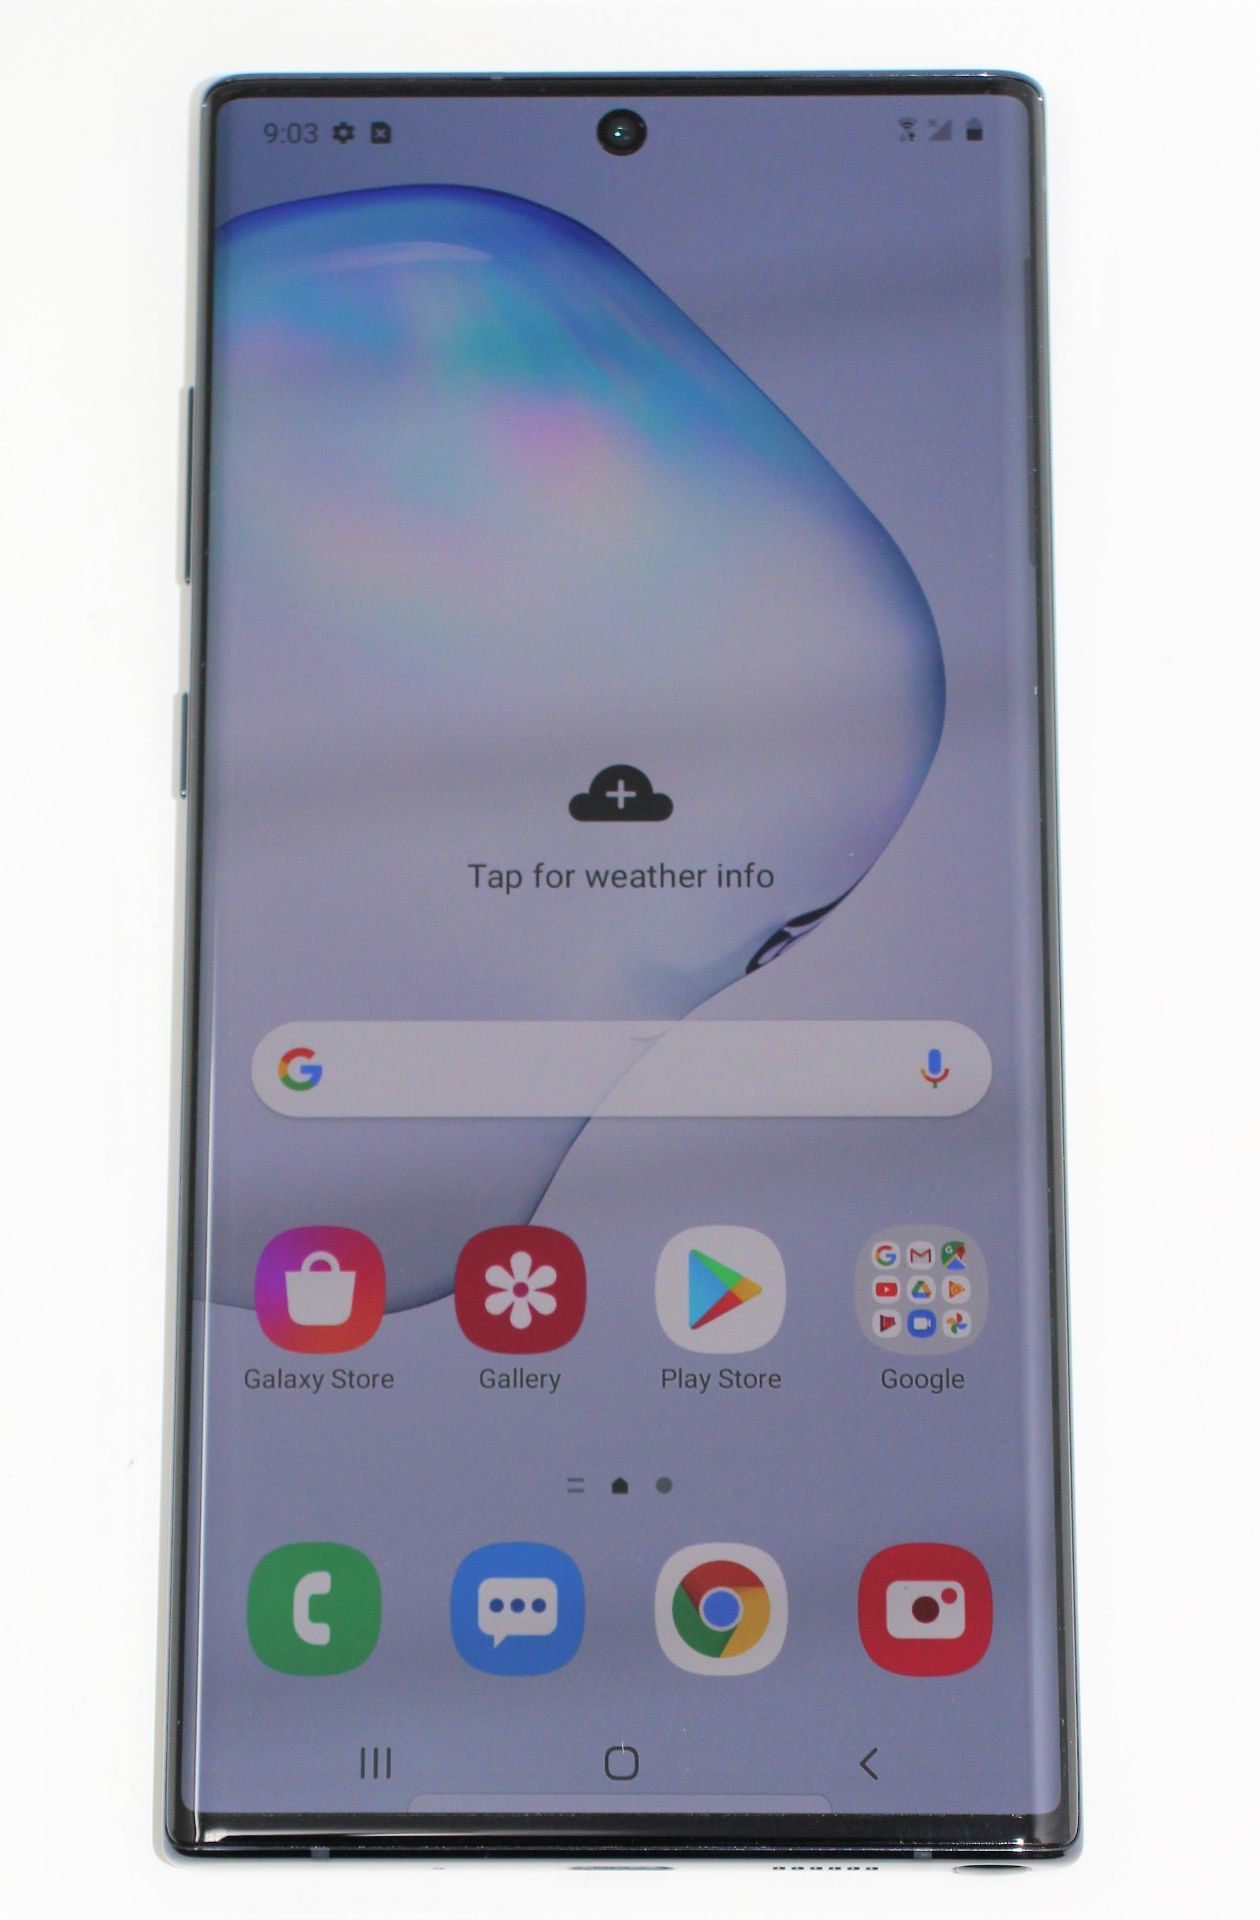 A pre-owned Samsung Galaxy Note 10+ SM-N975U 256GB in Black (FRP clear) (Checkmend report ID: